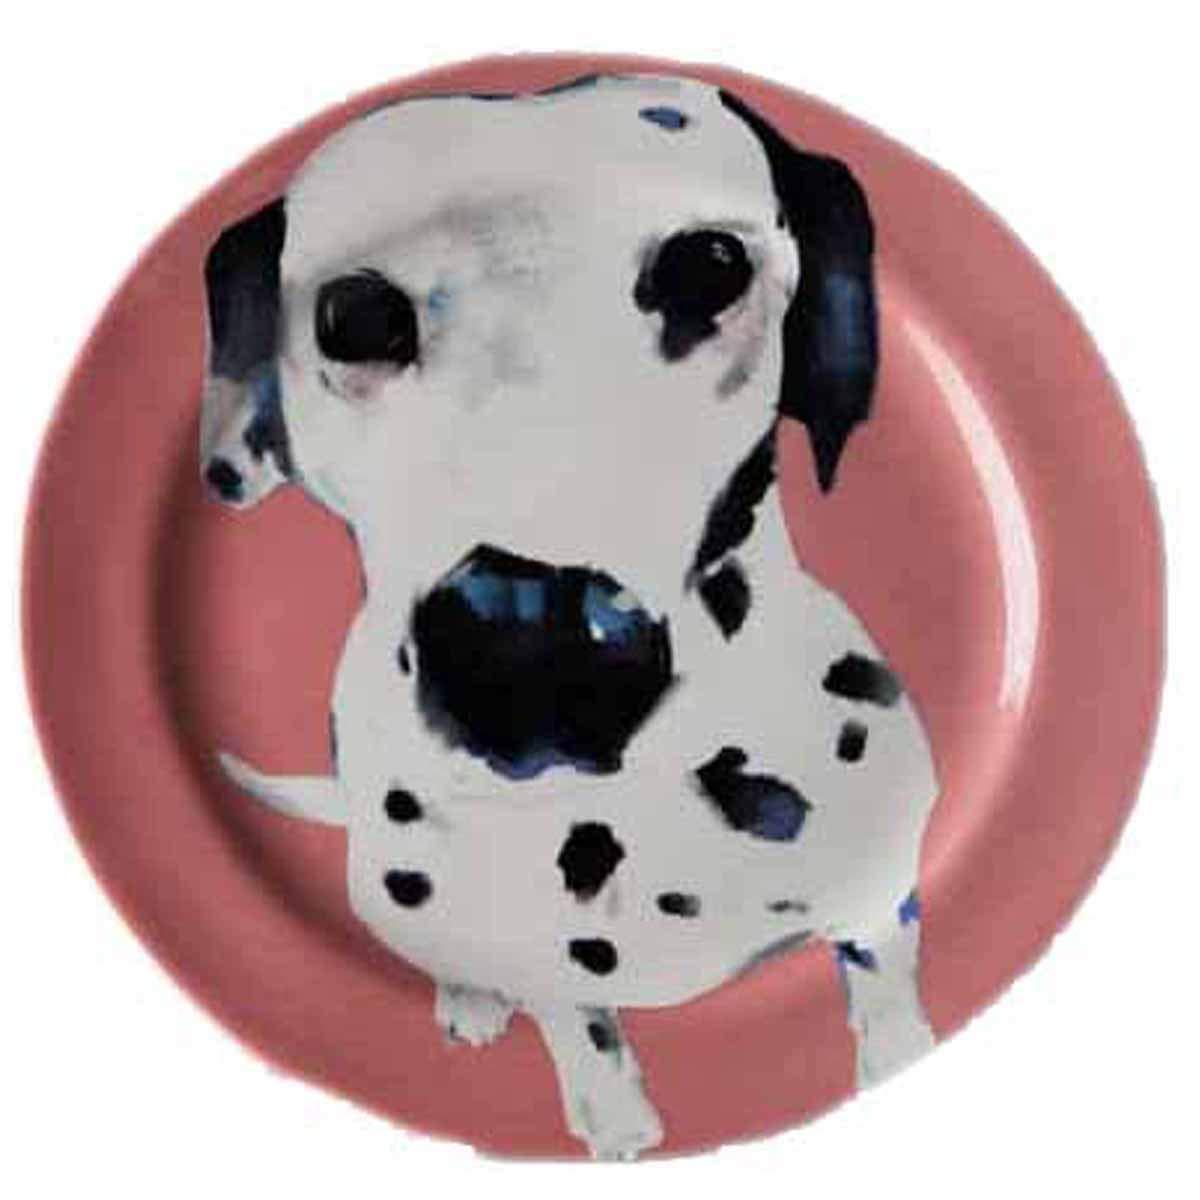 Dalmatian Pink Sally Muir Anthropologie Dog-a-Day Stoneware Dessert Plate